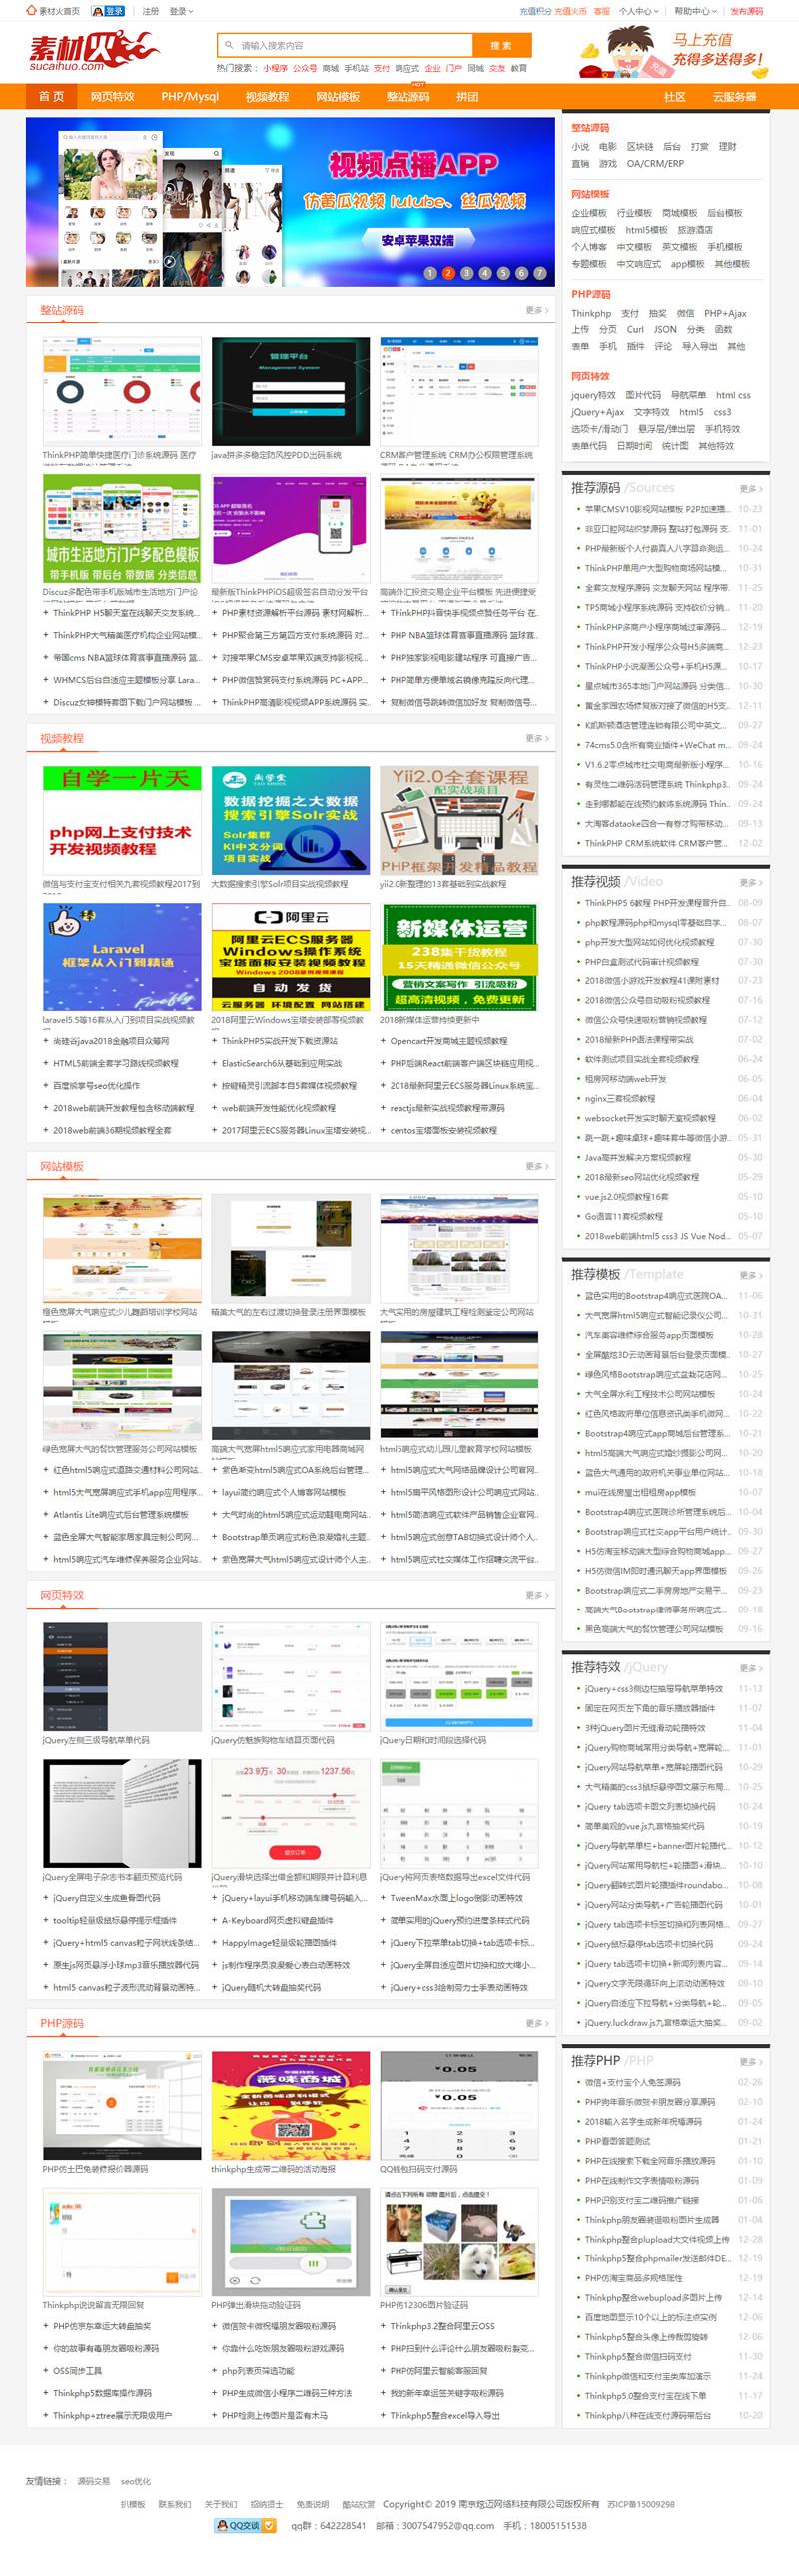 Thinkphp仿素材火整站修复版网站系源码 带会员系统+虚拟产品购买-爱资源分享